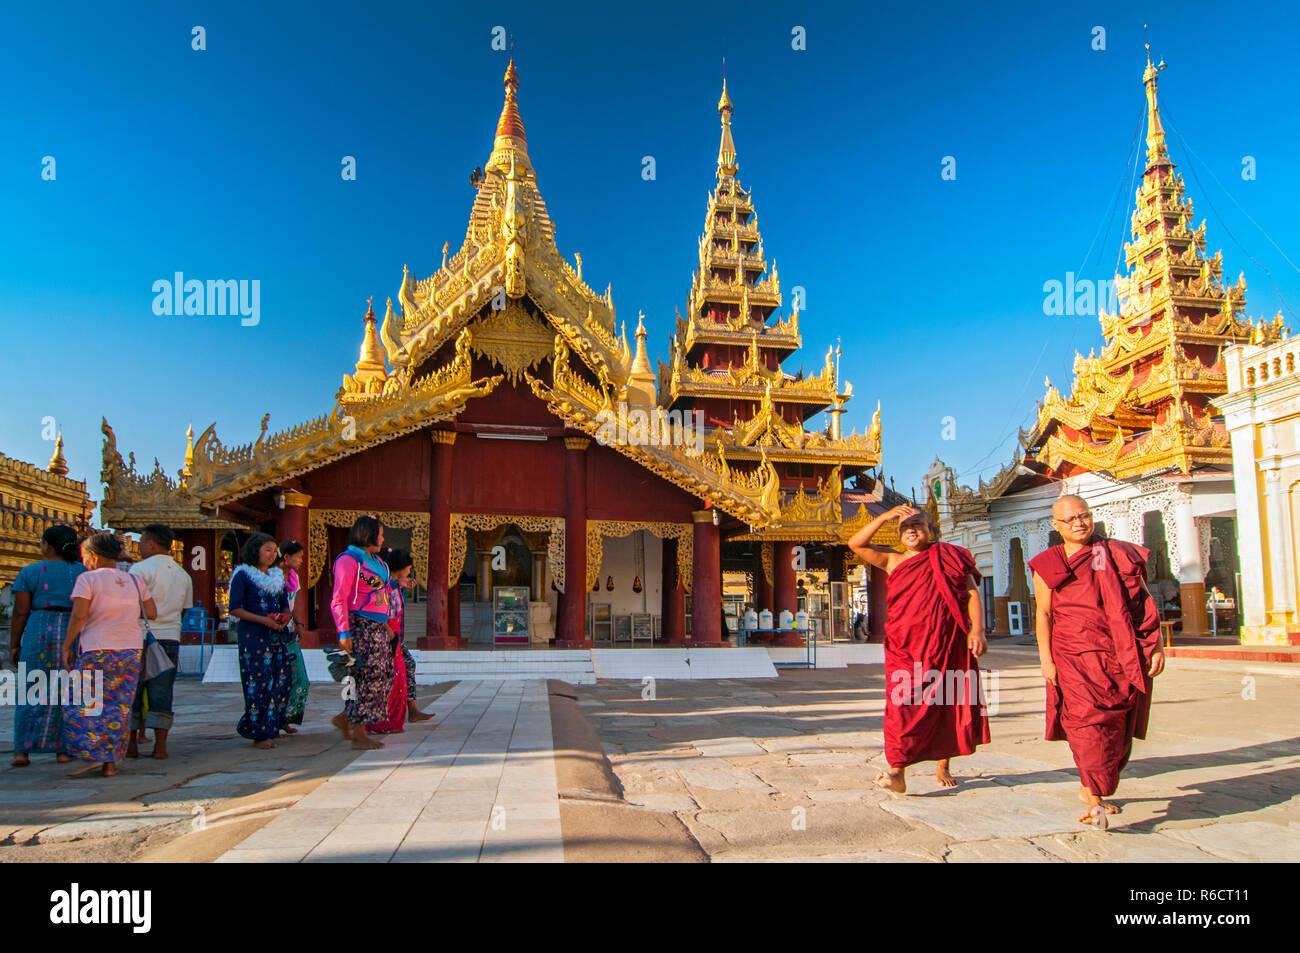 Novice Buddhist Monks Walking Around The Sacred Shwezigon Paya Complex, One Of Myanmar'S Most Revered Pagodas, In Nyaung U, Bagan, Myanmar (Burma) - Stock Image